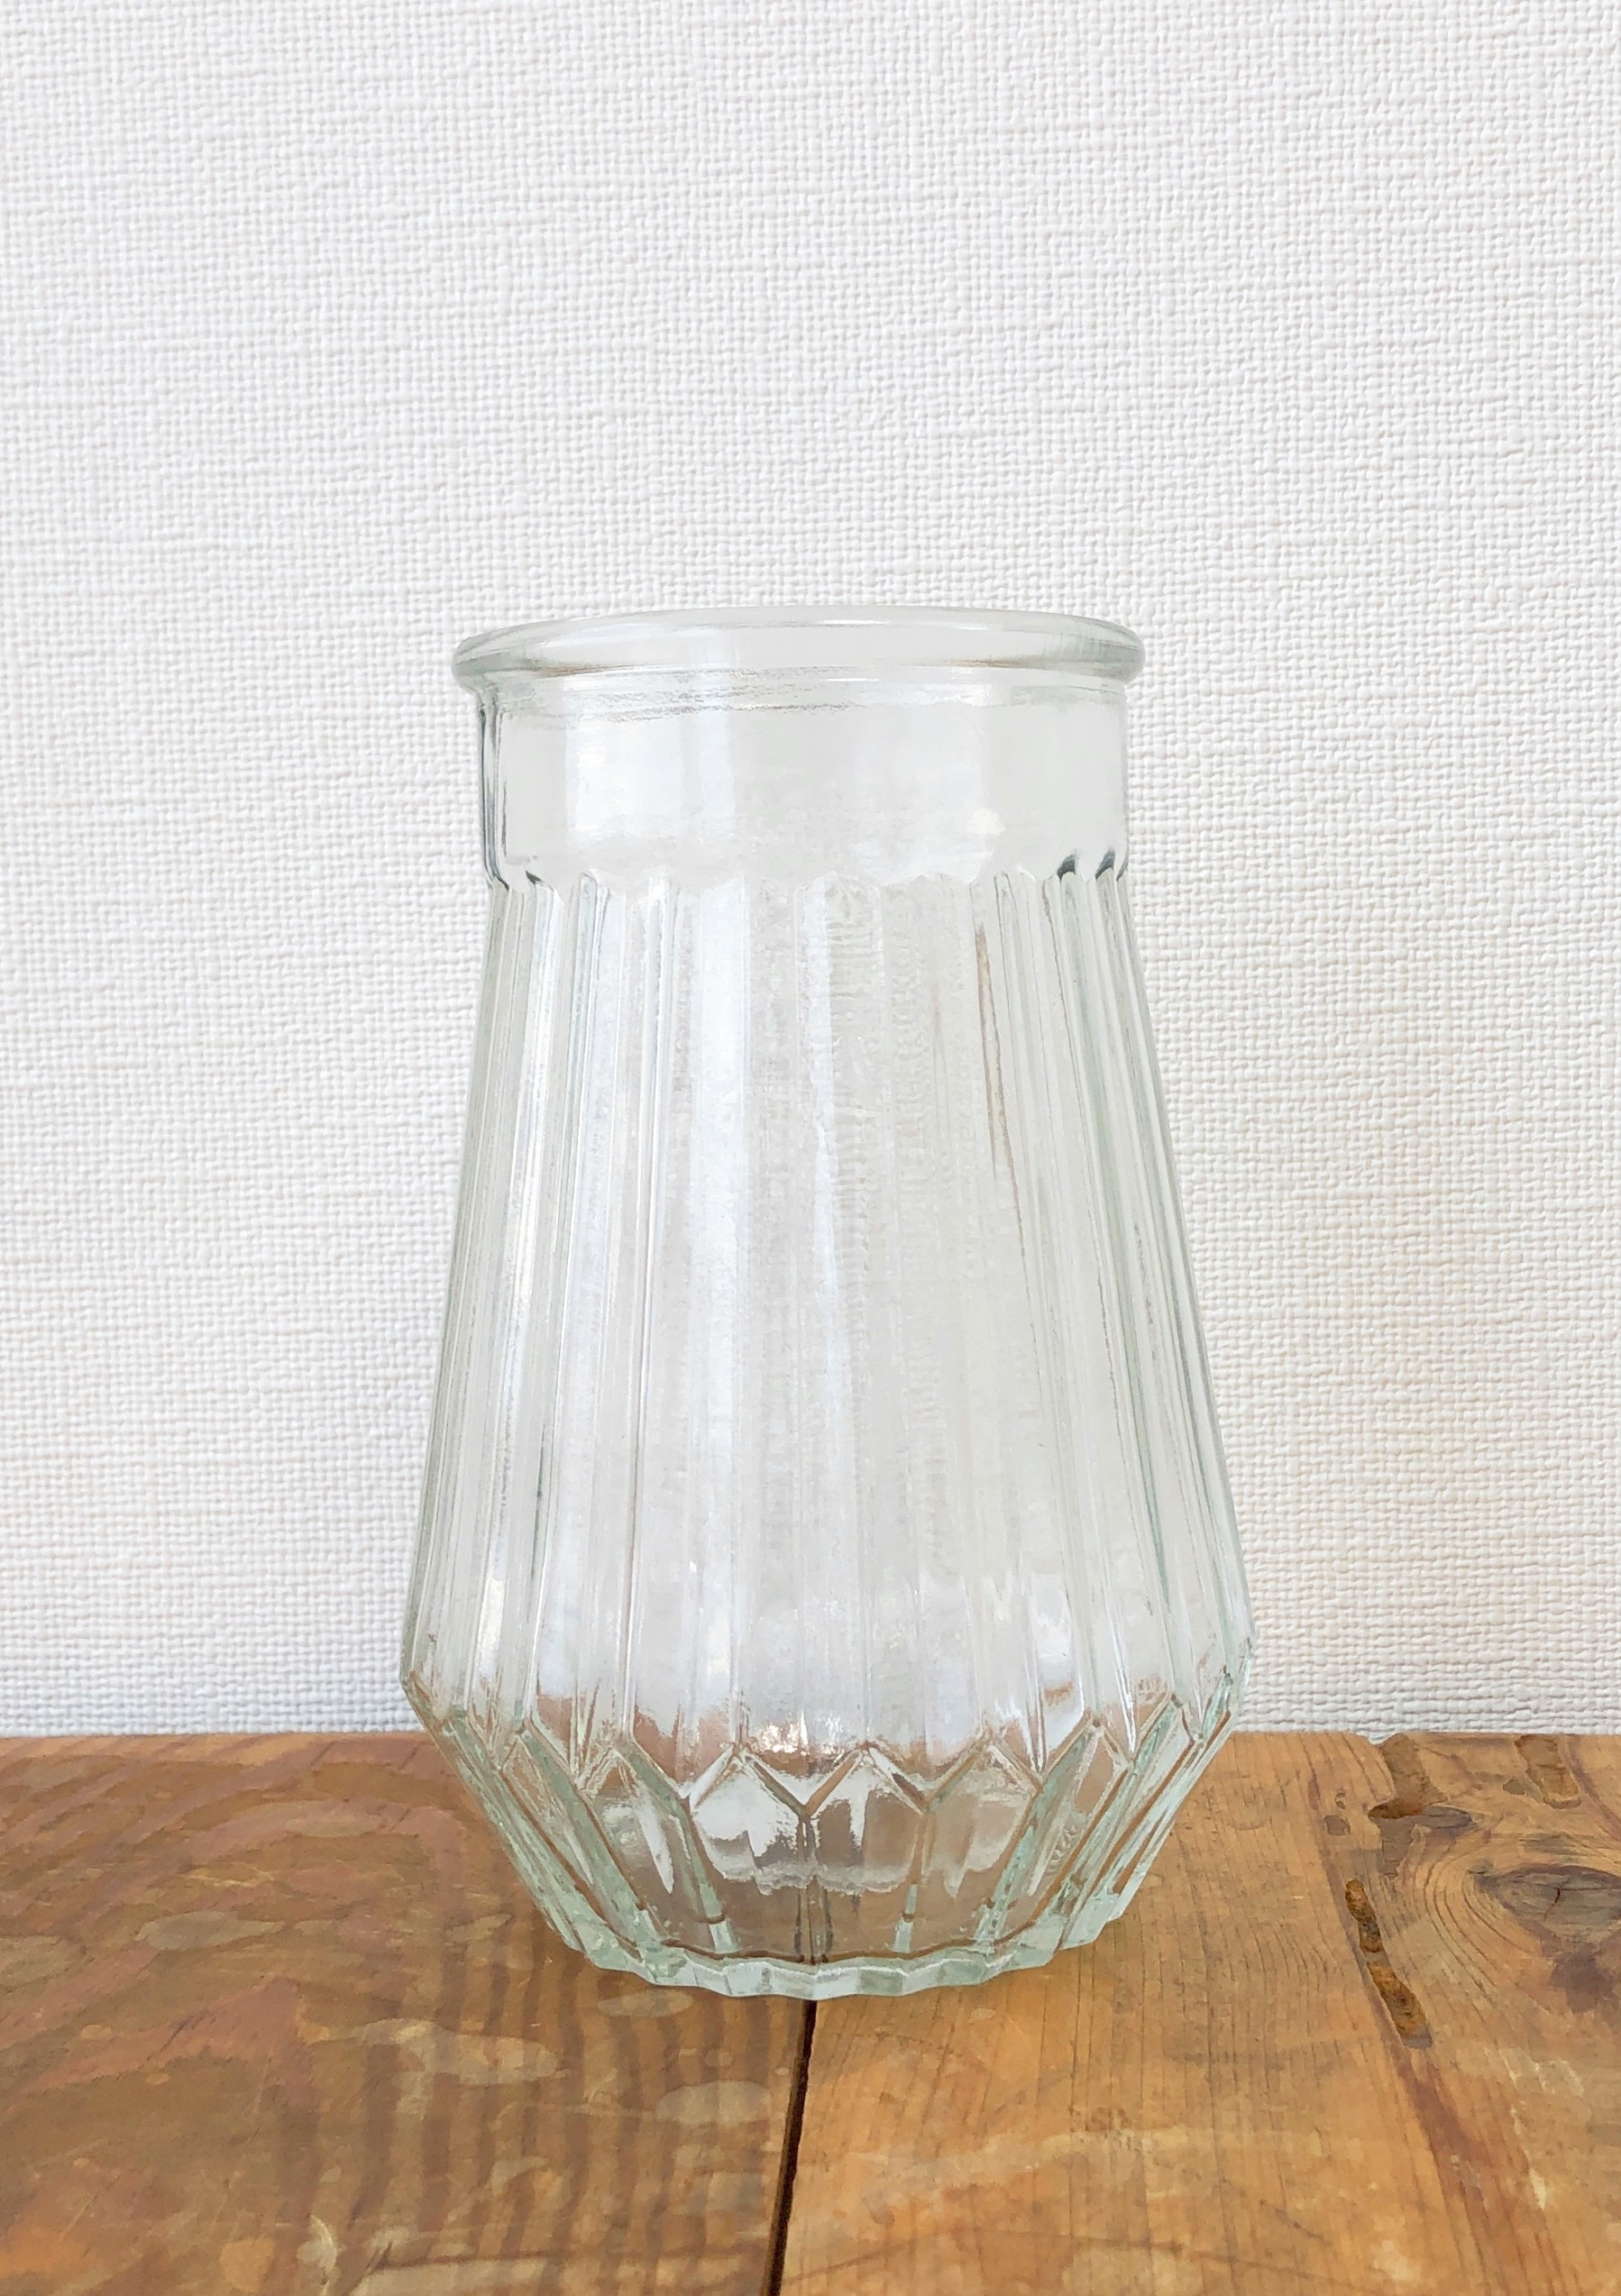 LOT1 ガラス フラワーベース 22527 お買い得!!